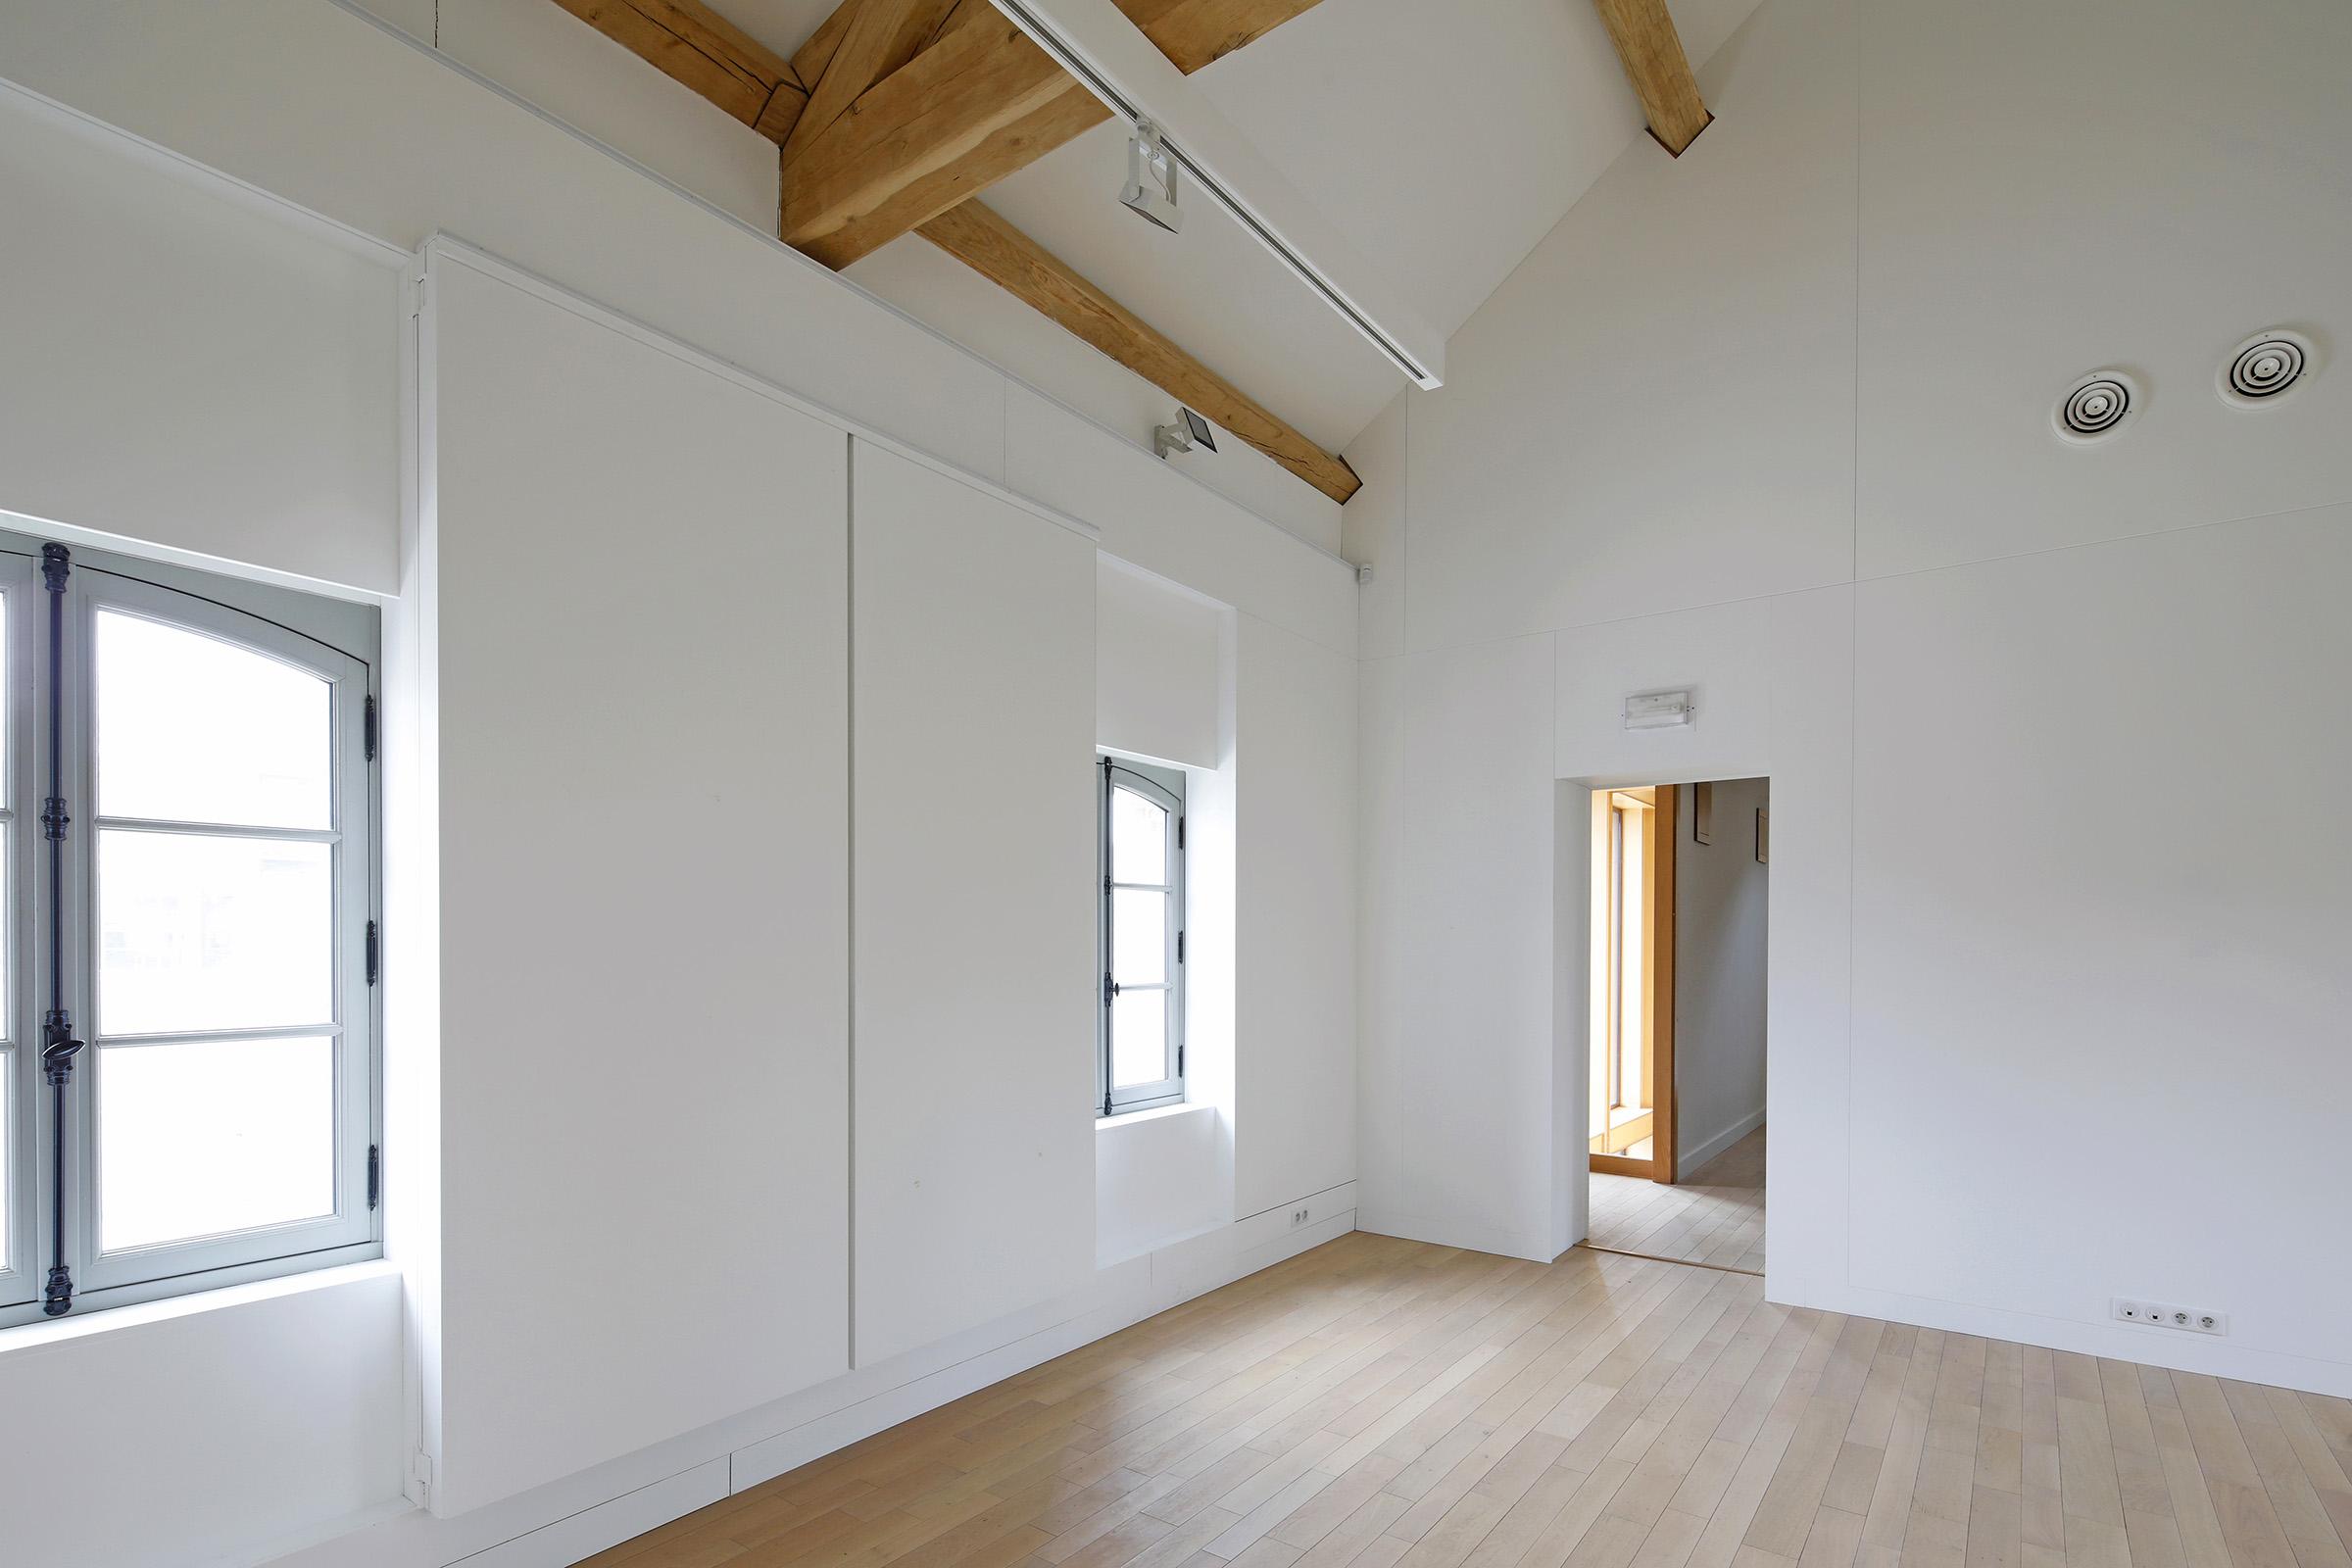 Amilly - La Maison Saint Loup - Interieur - Sylvain Dubuisson 038.jpg